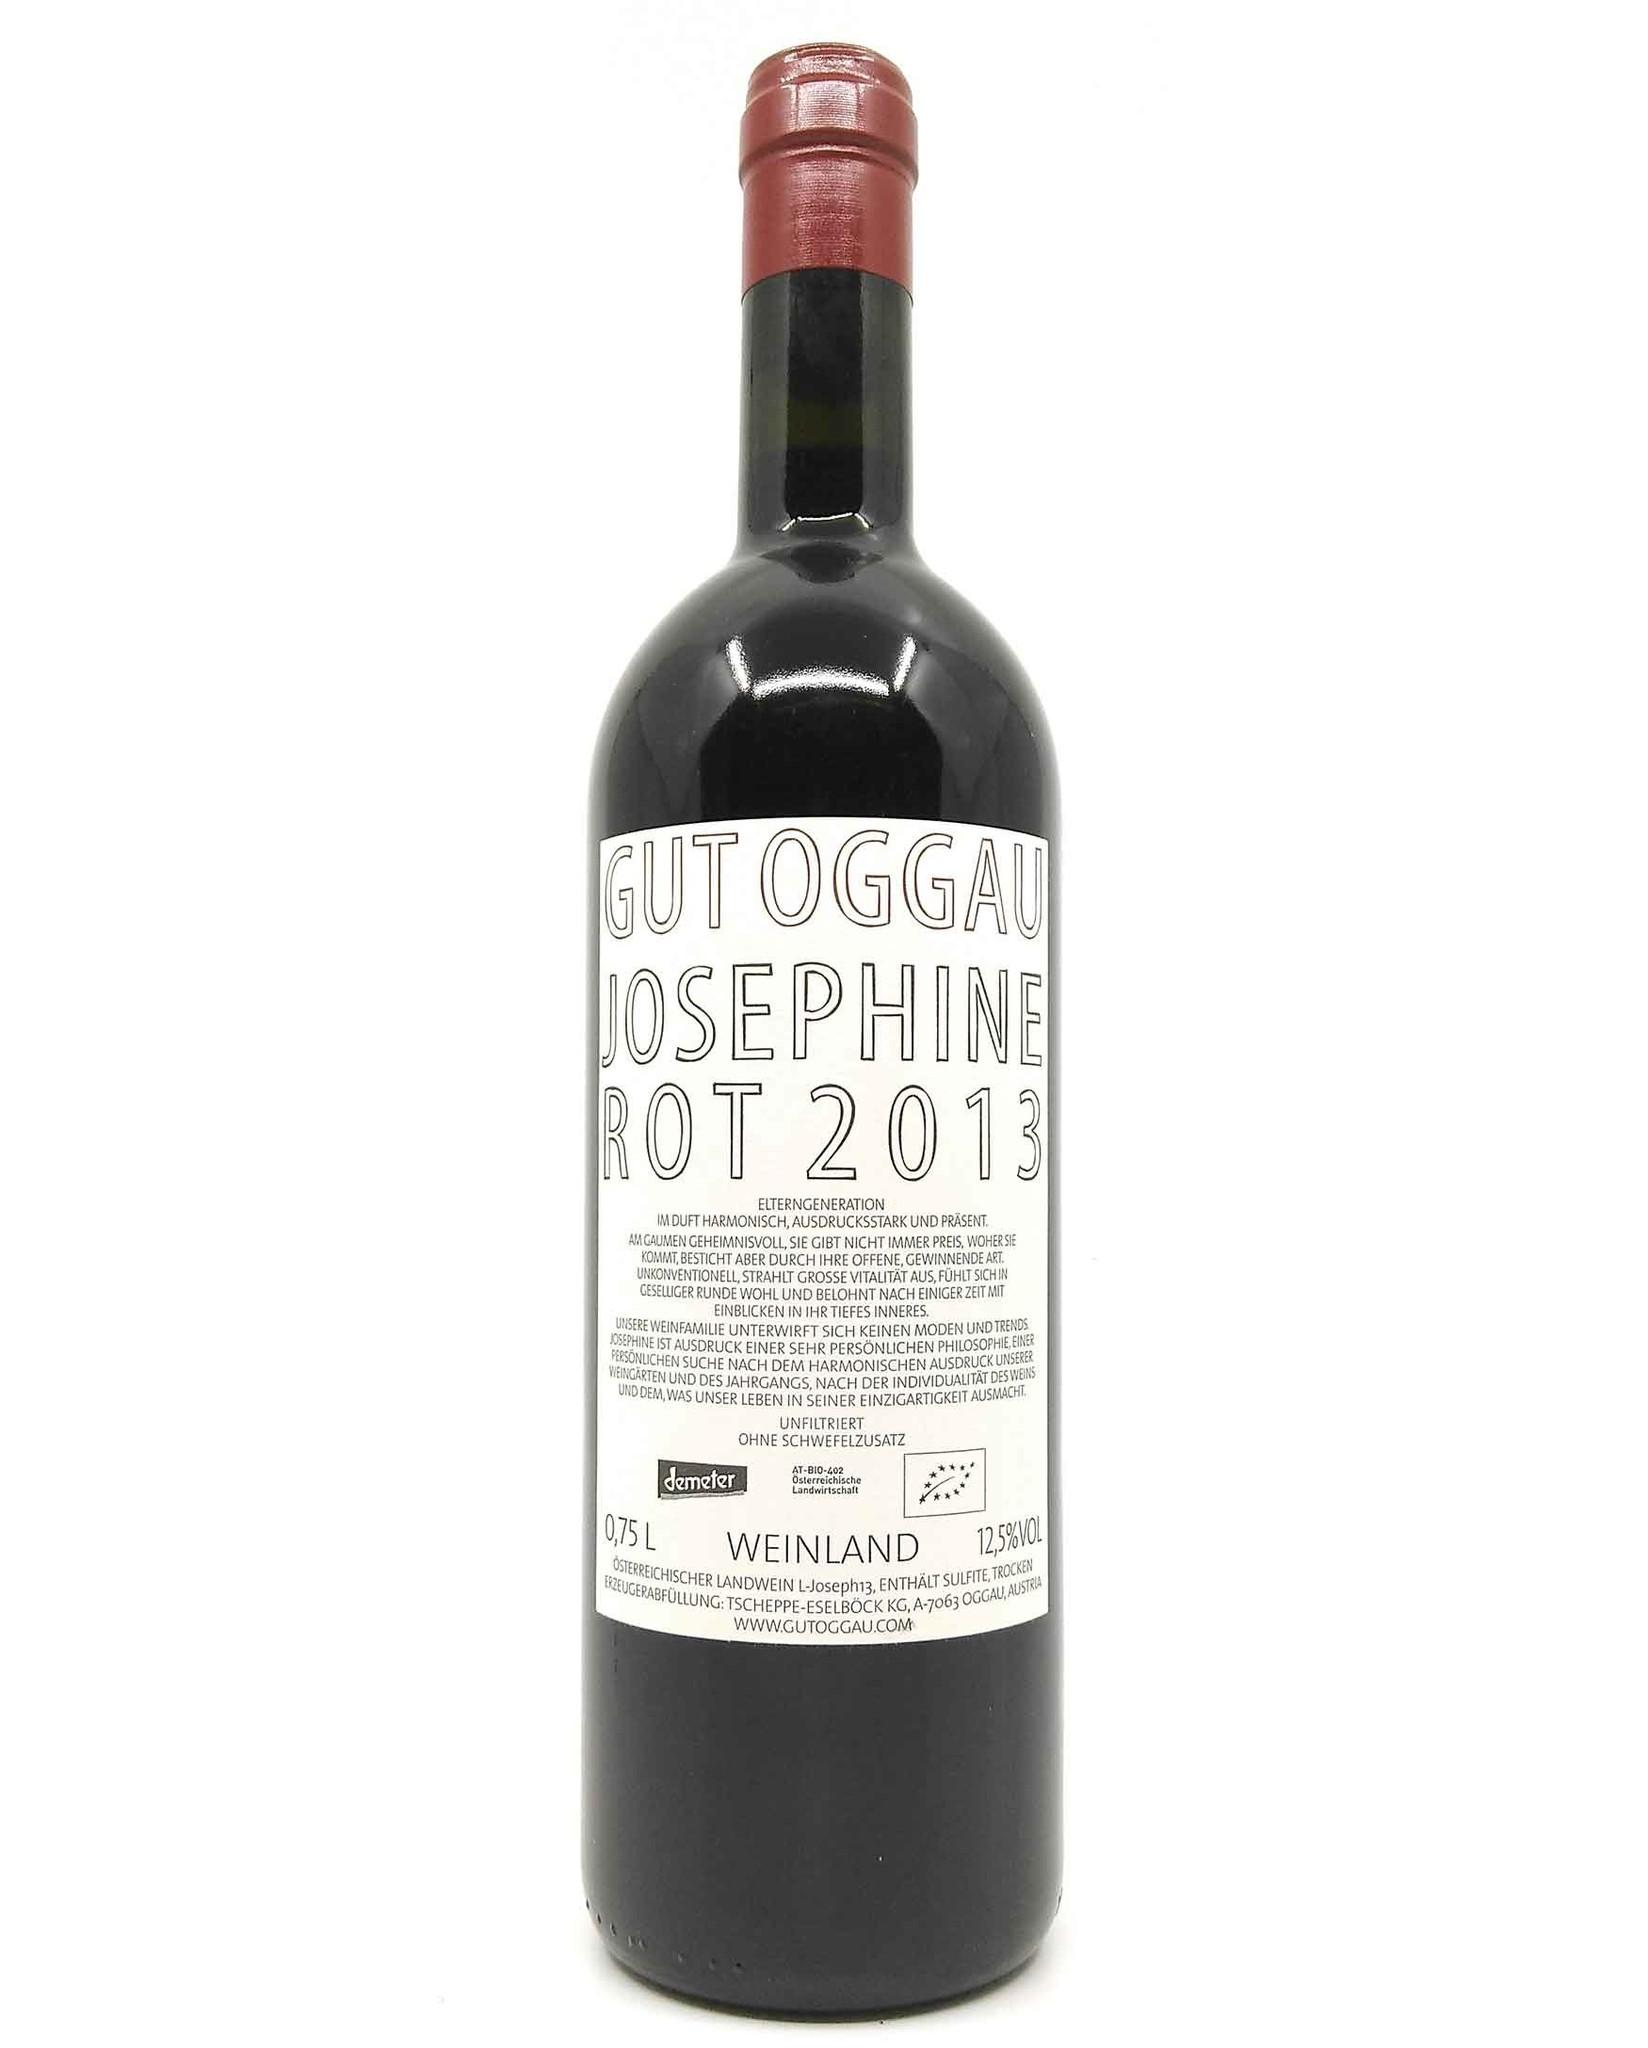 Gut Oggau-Josephine 2013